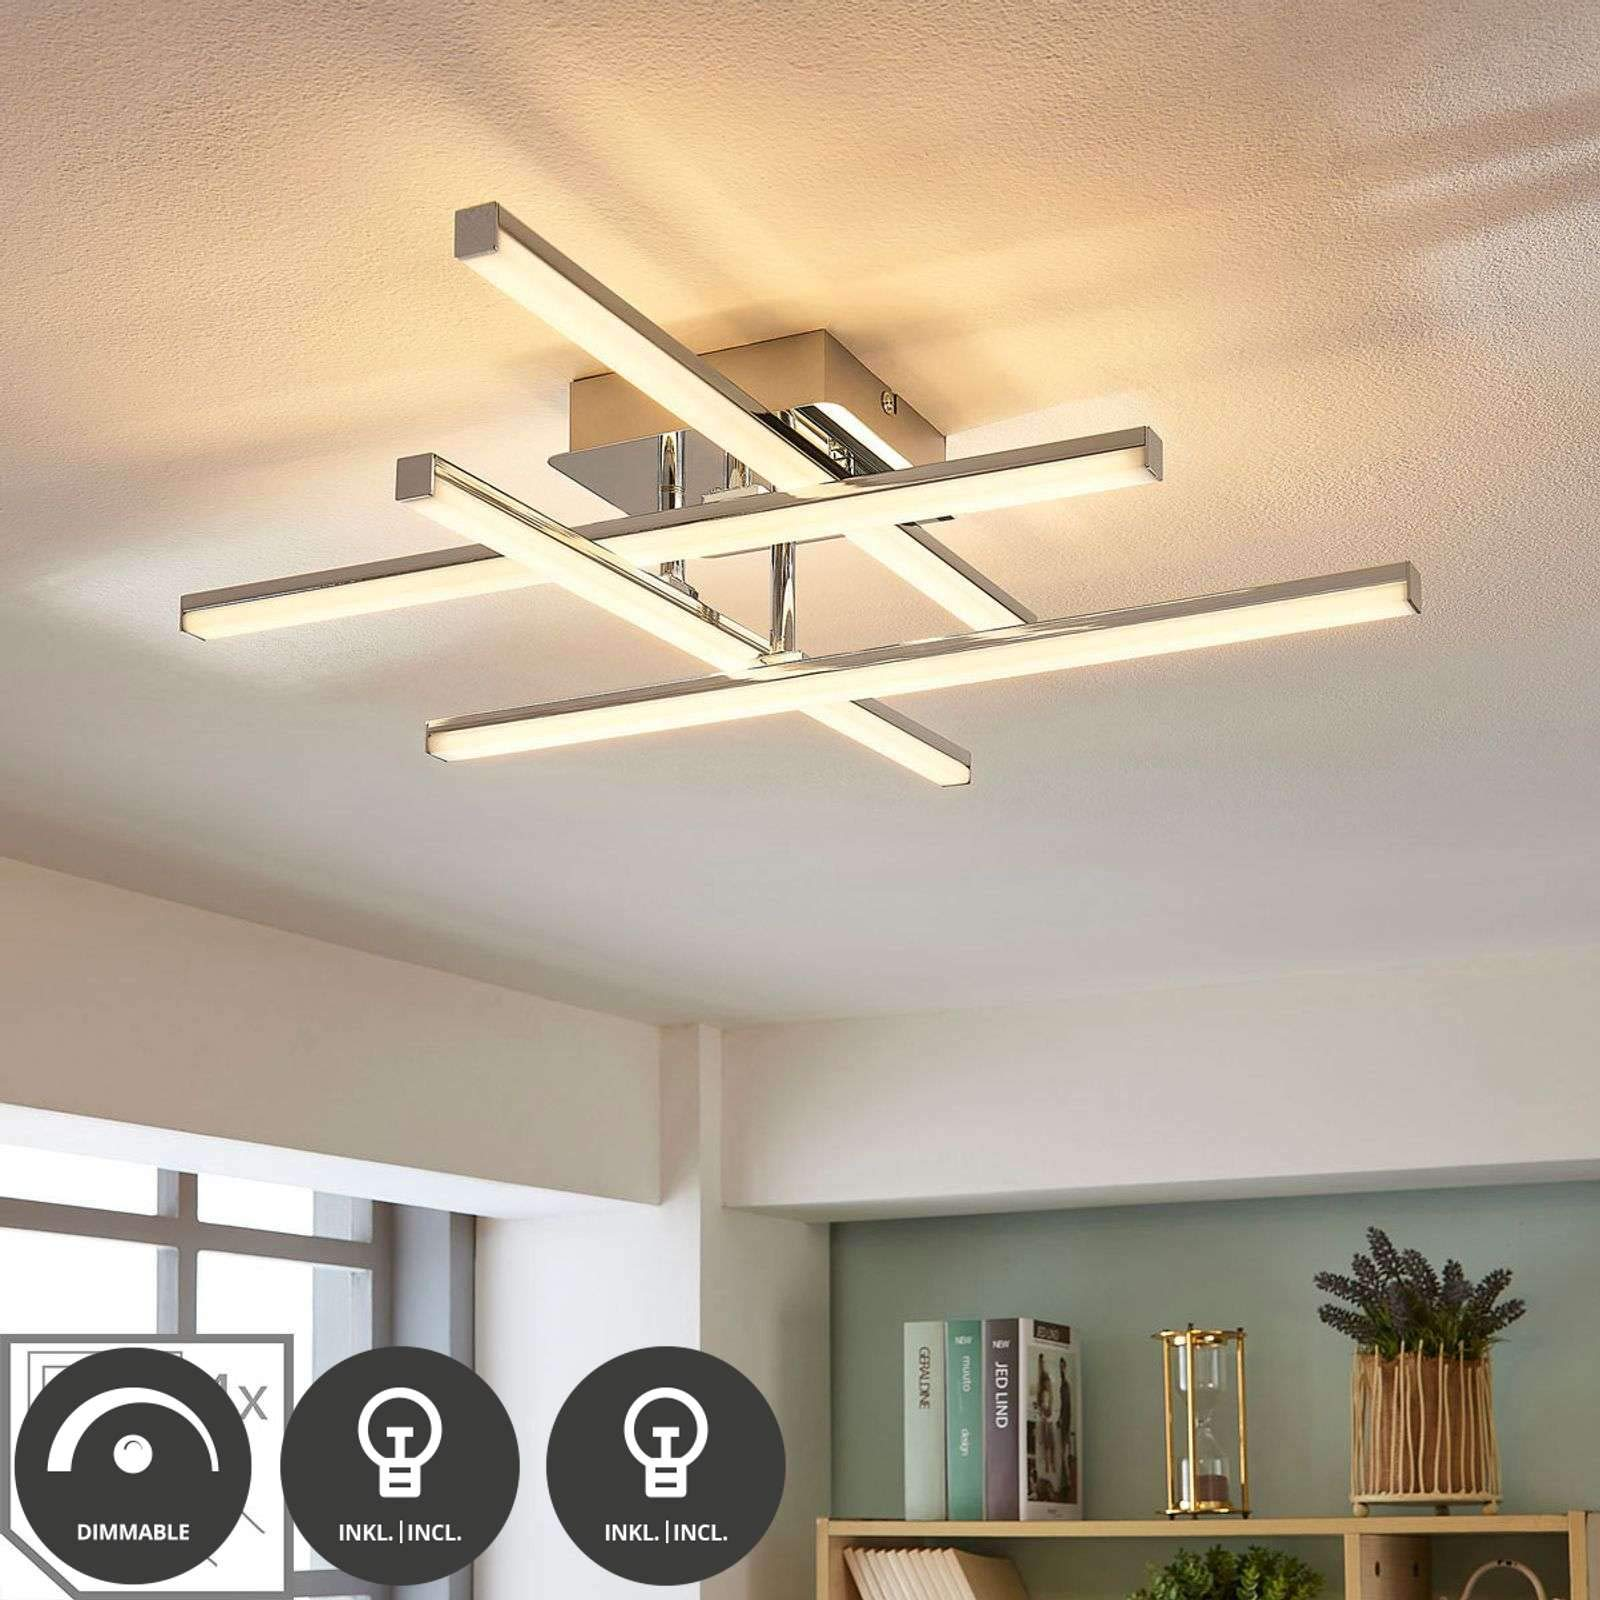 Lindby Moderno Plafón moderno cromo con LED regulable - Korona  Acero/Plástico Otros Incluye LED Max. 19 x 19 Watt